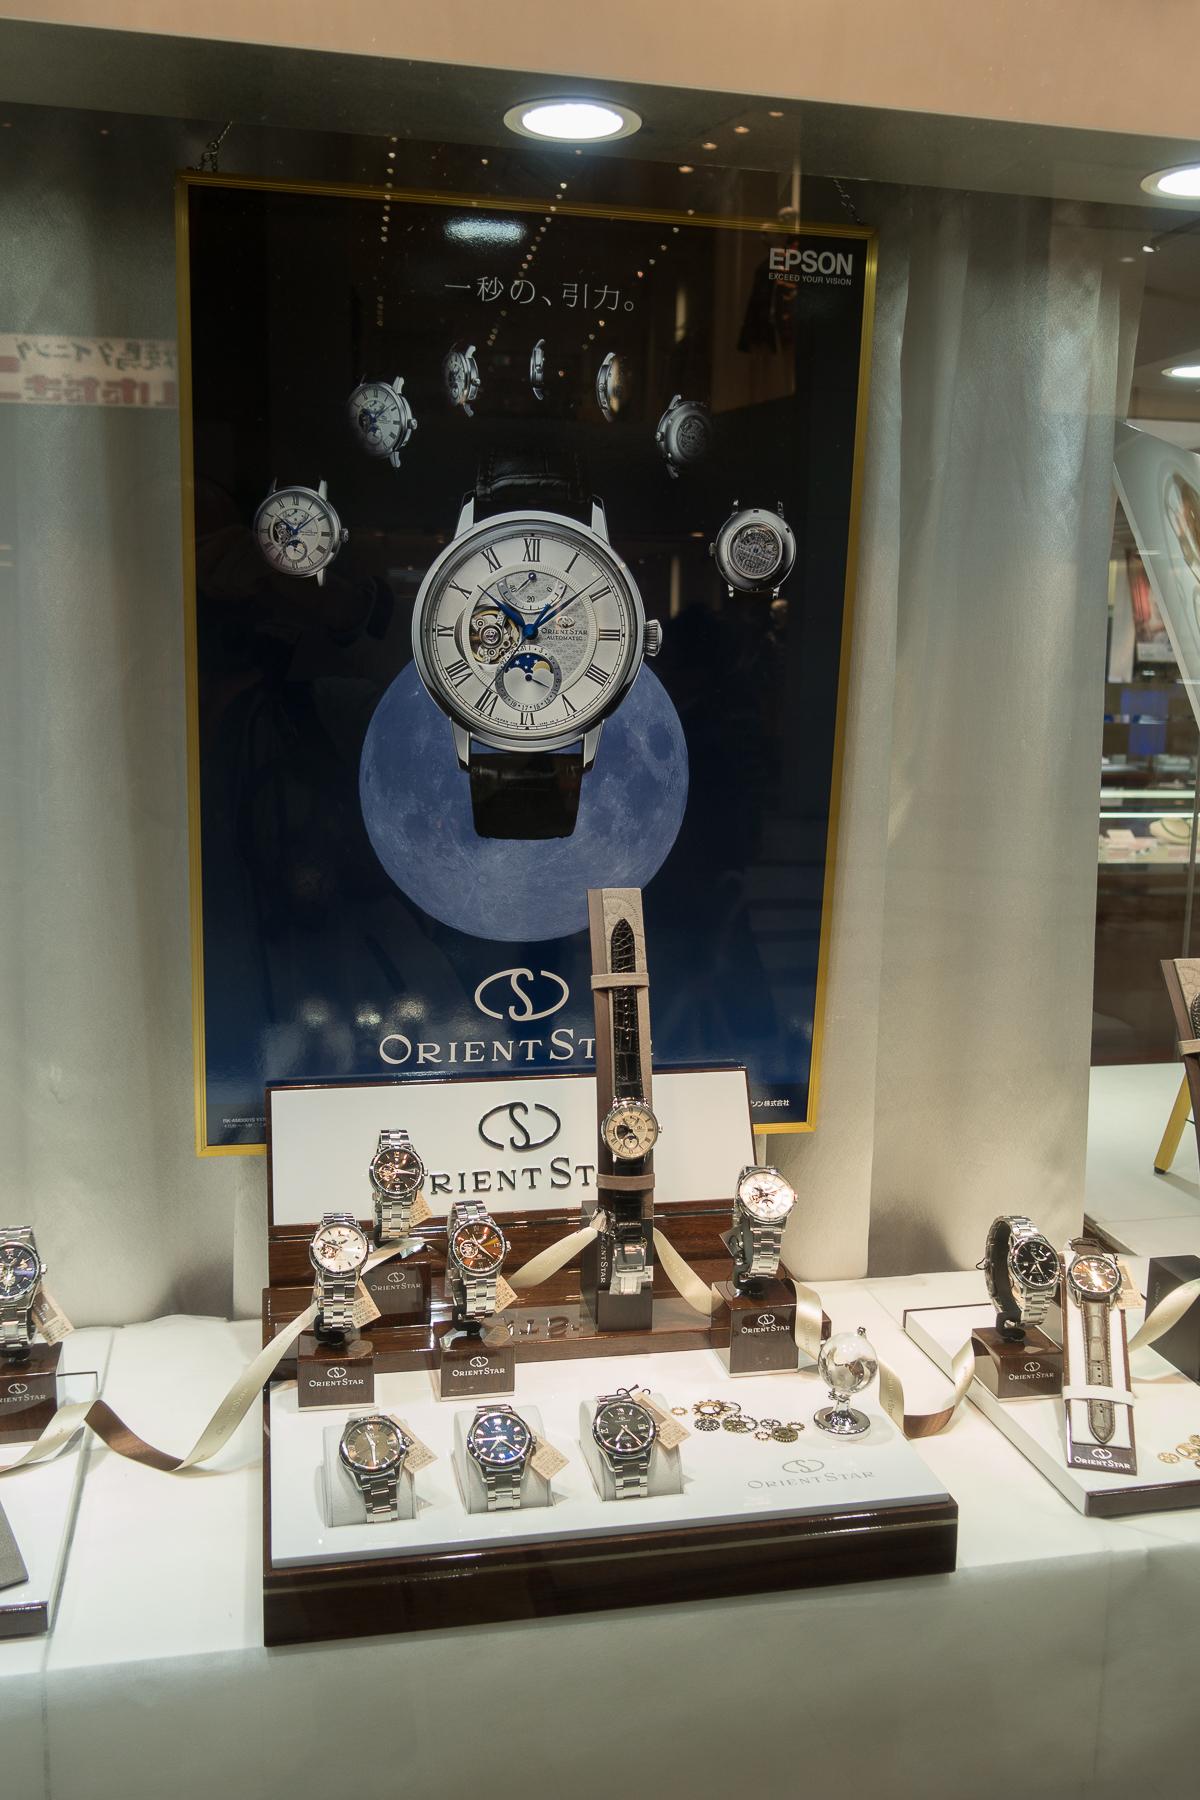 Orient Star window display